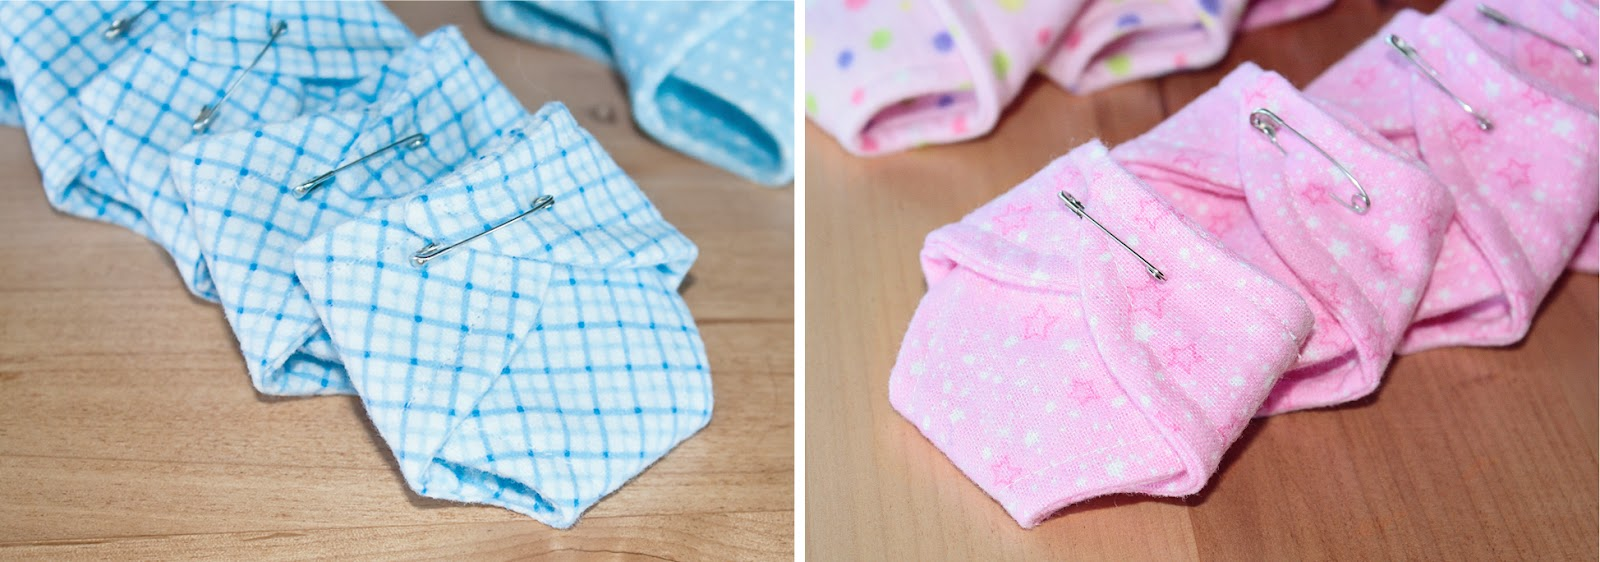 diaper2.jpg